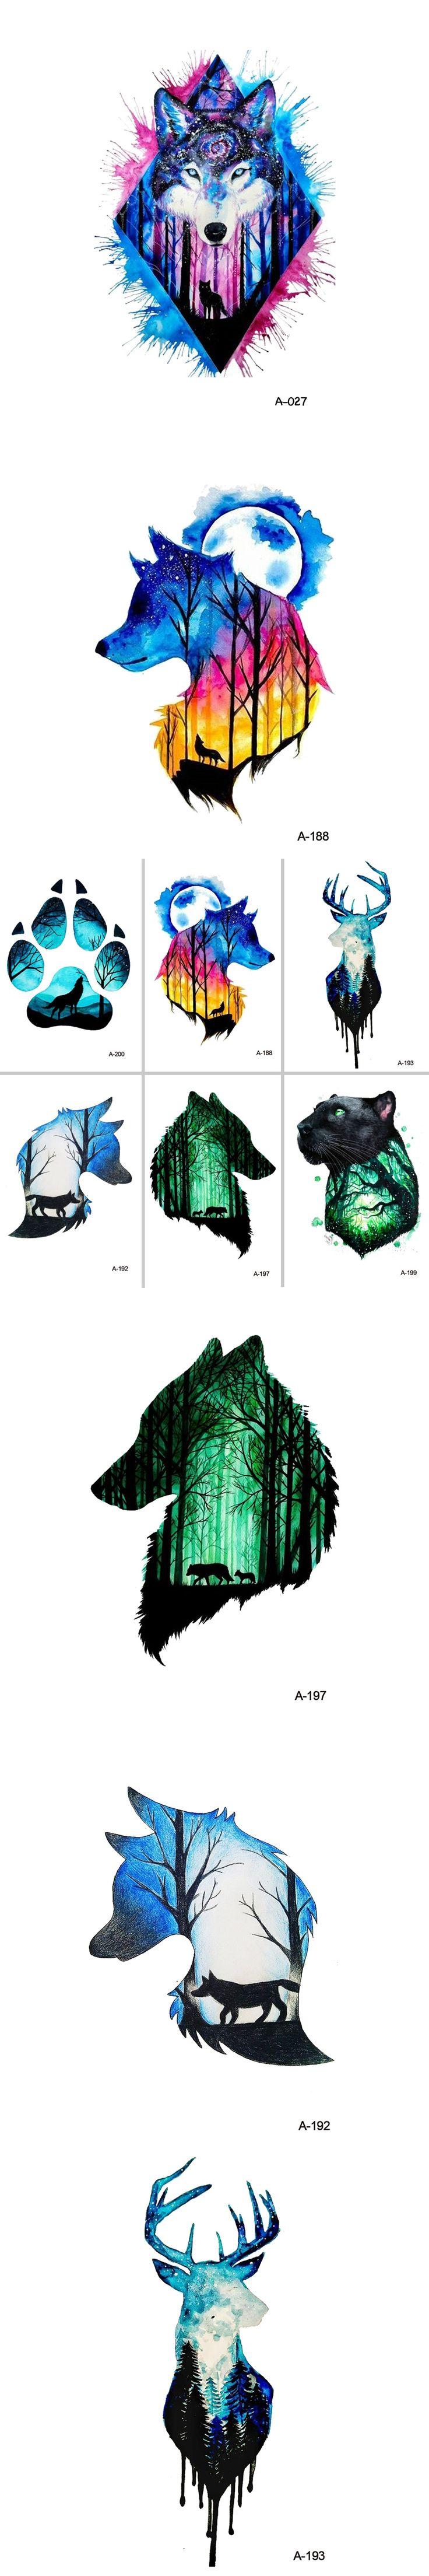 WYUEN Hot Design Wolf Head Animal Temporary Tattoo for Men Waterproof Tatoo Sticker Fashion Body Art A-027